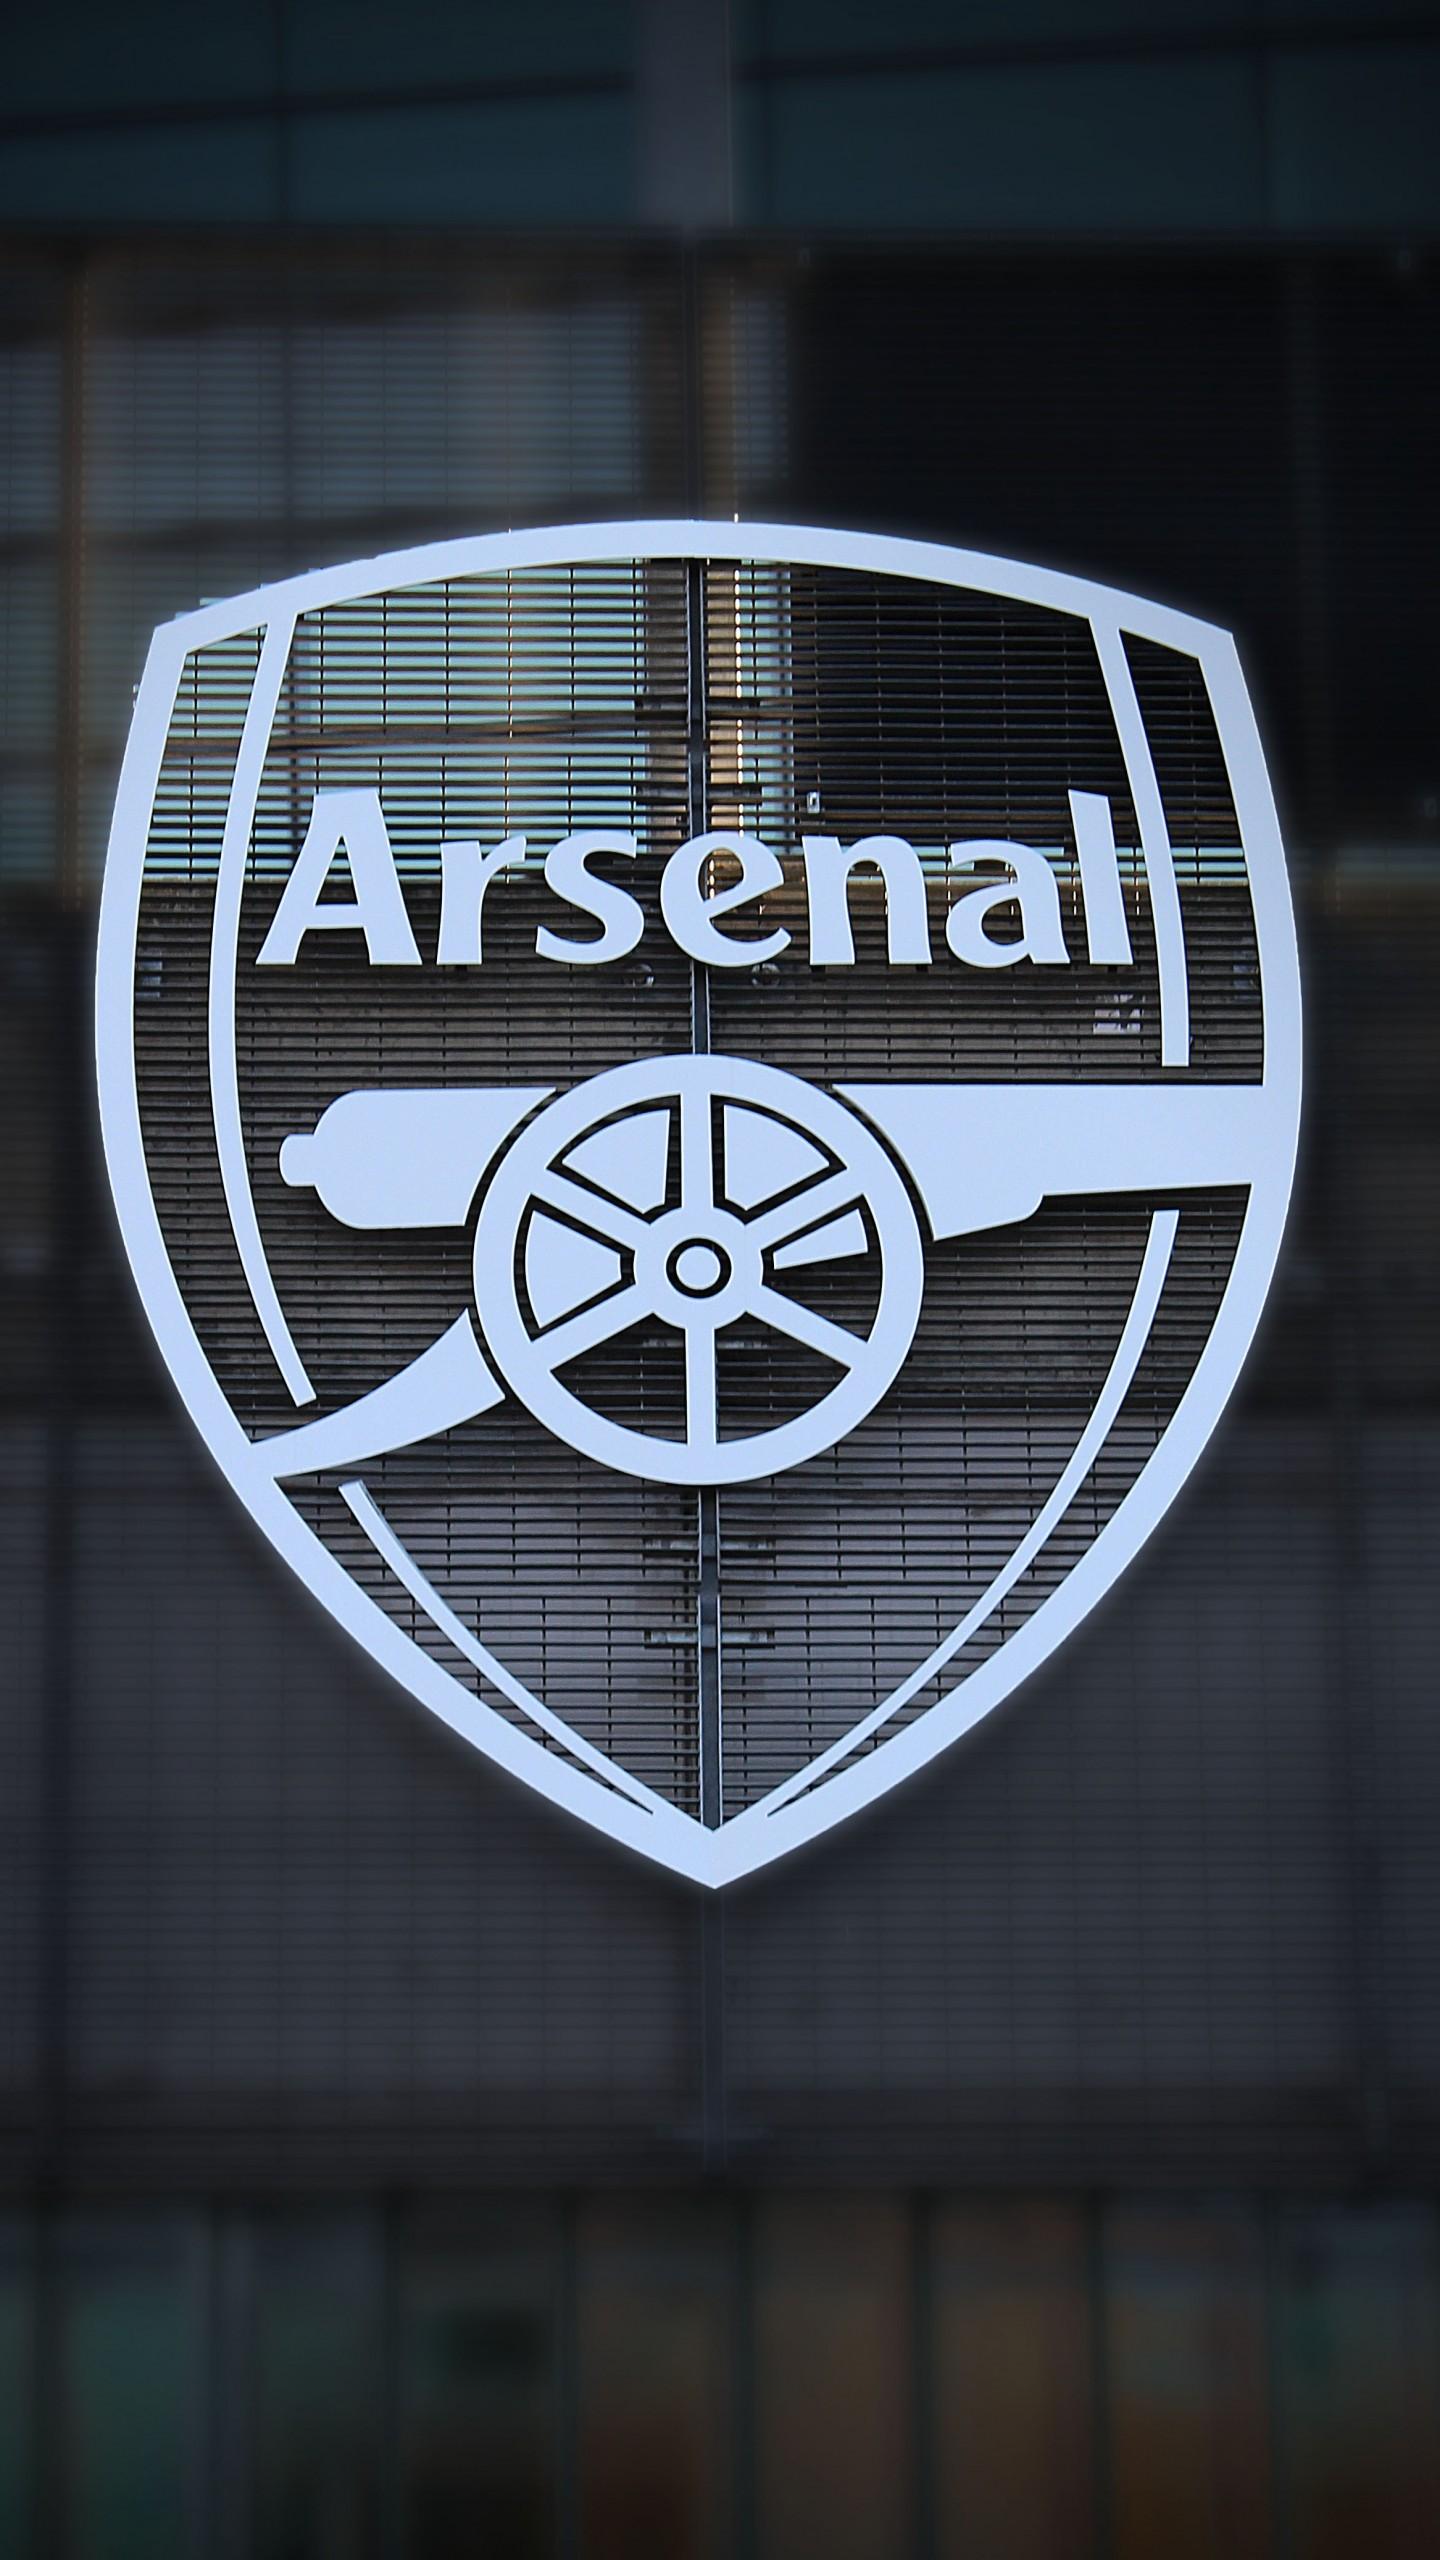 arsenal black and white logo